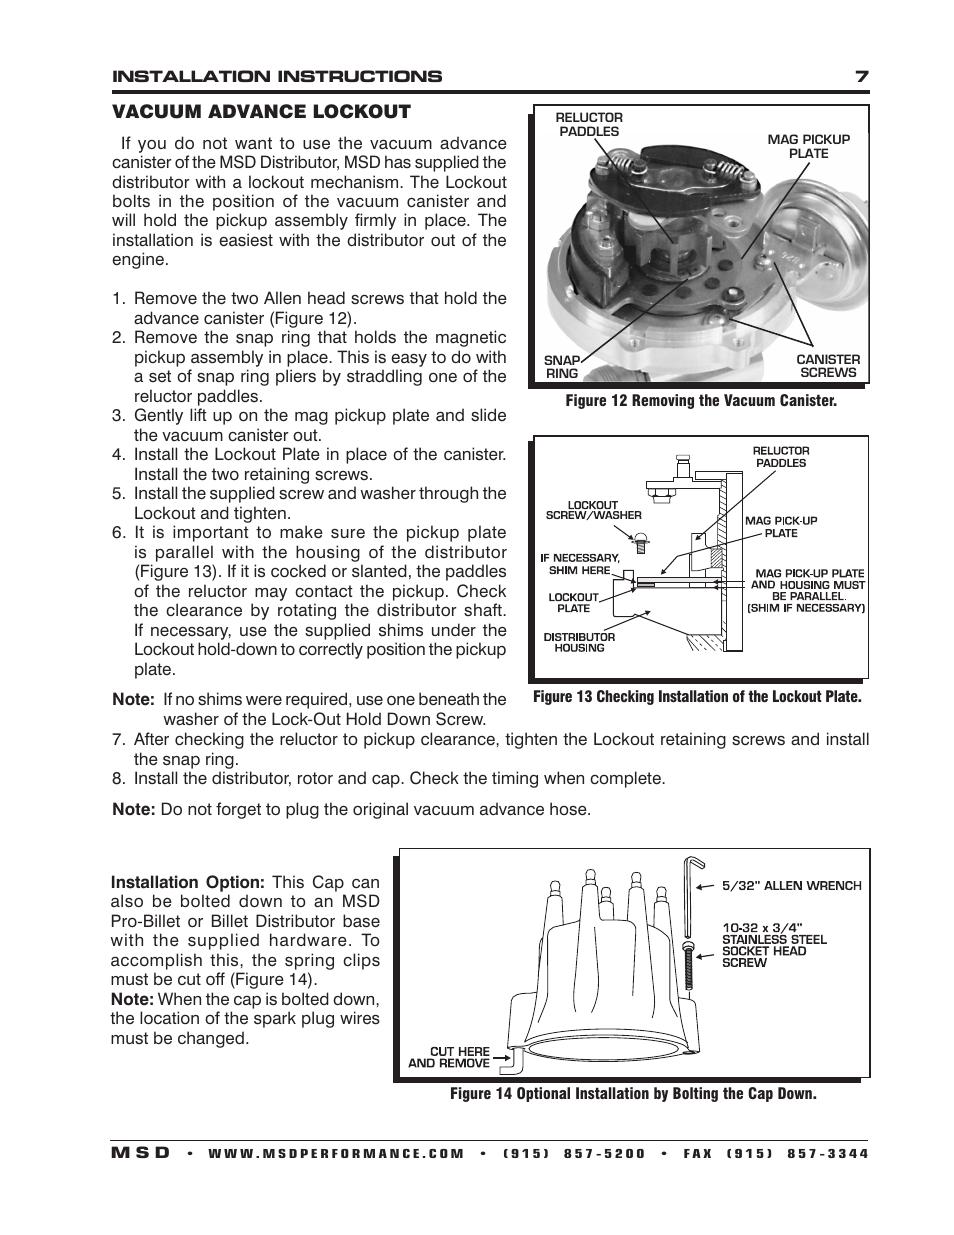 msd 8360 wiring diagram data wiring diagram today